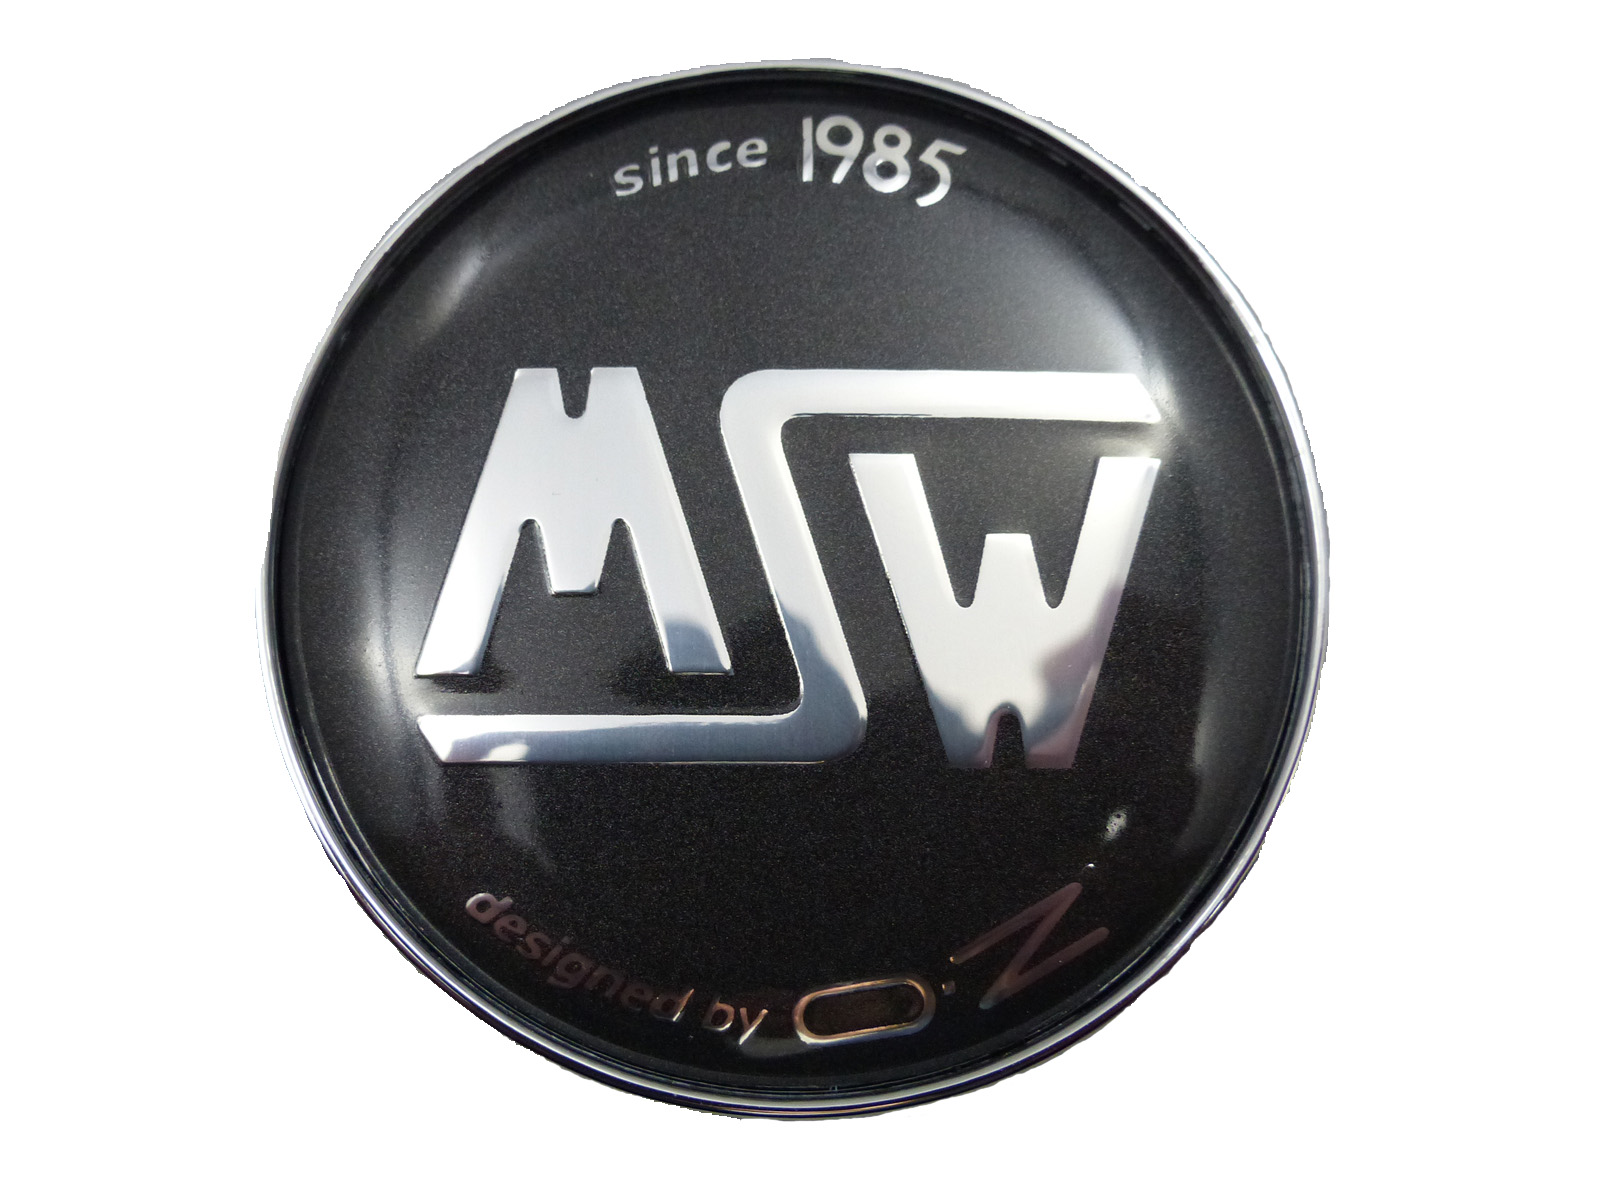 MSW PC 080 1985 PCF-080 60mm Nabendeckel Nabenkappen Felgendeckel Alufelgen